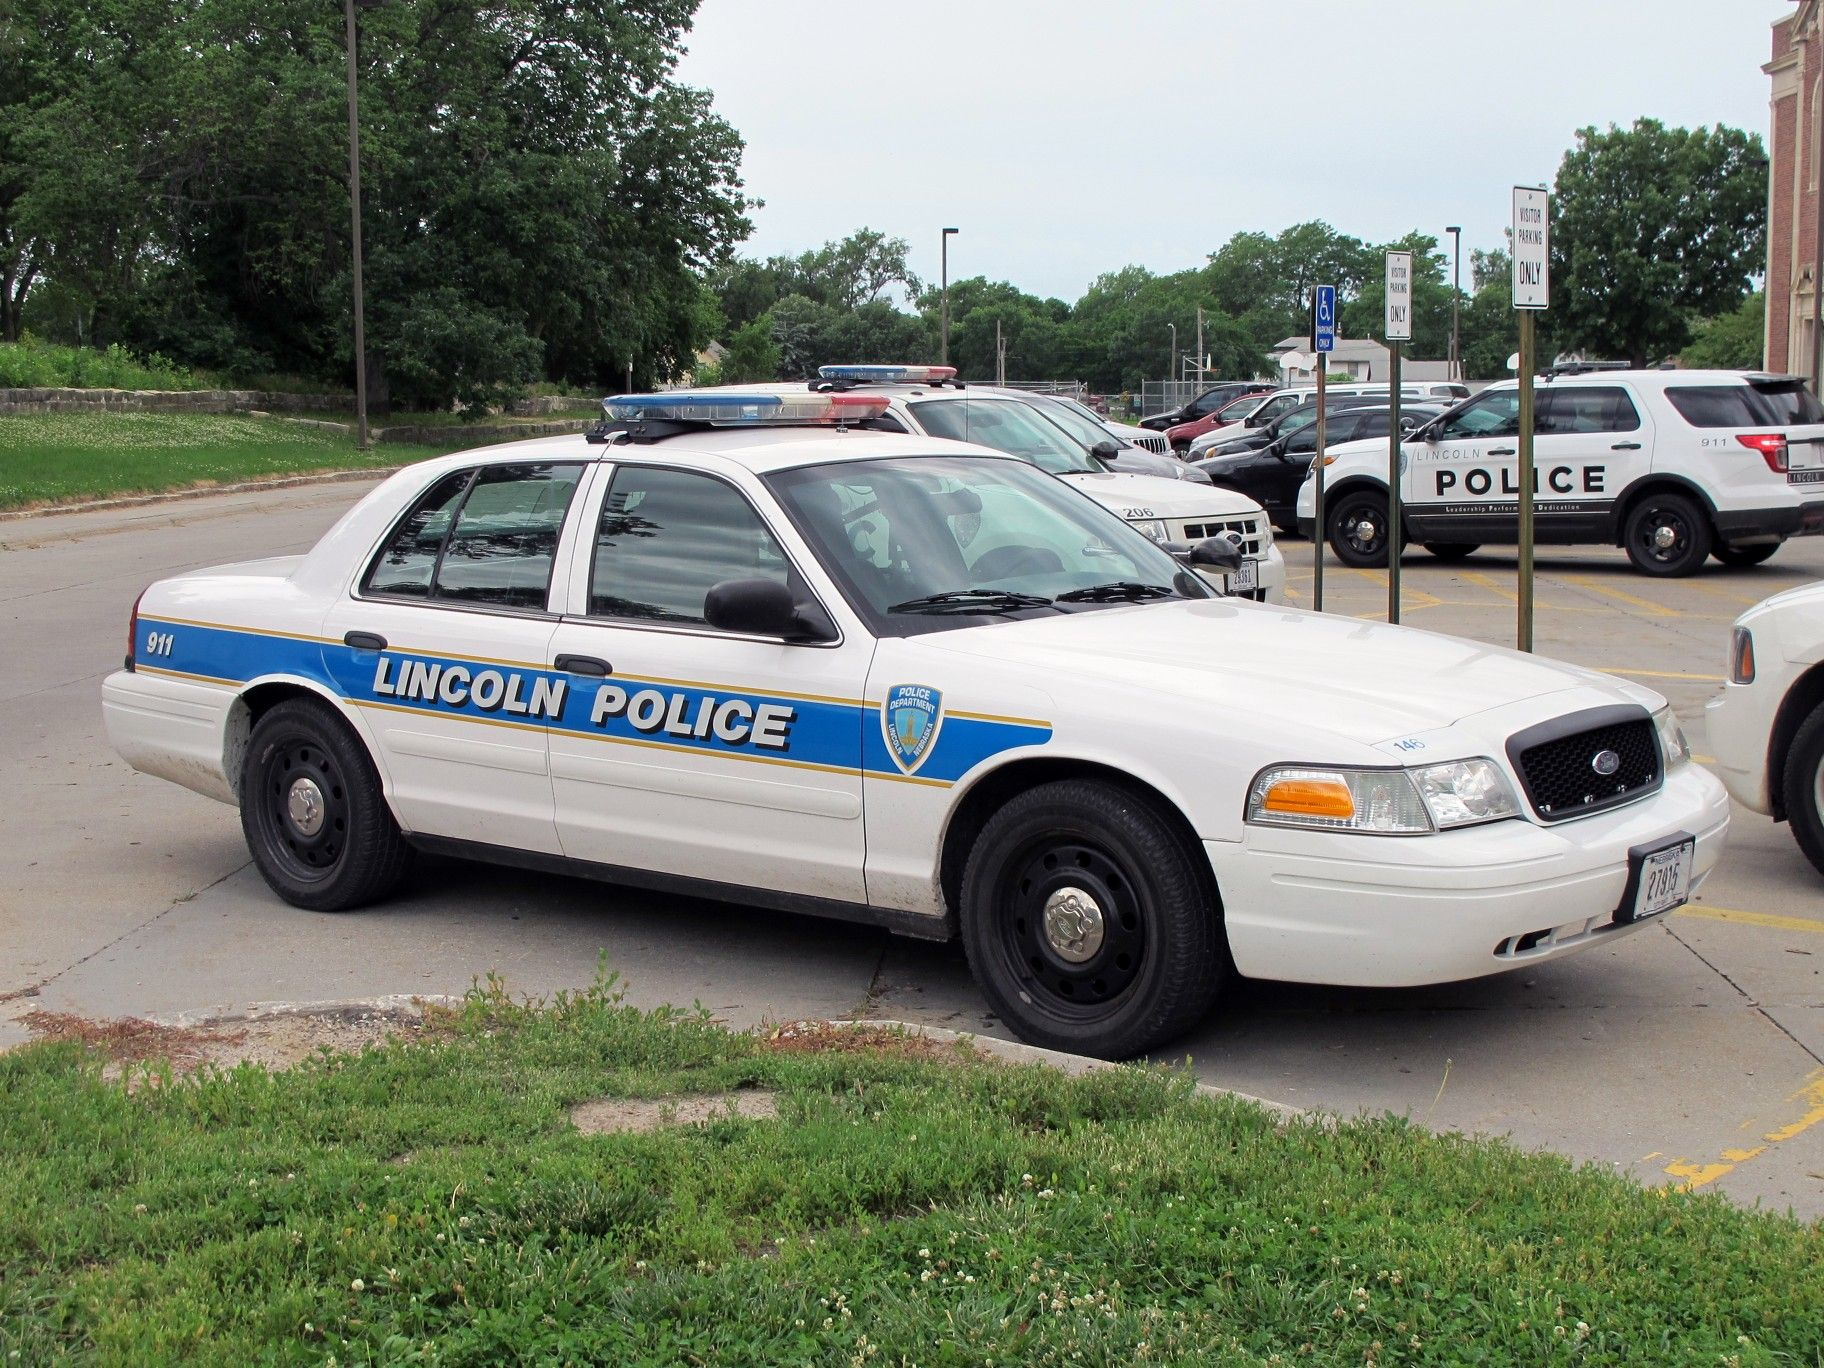 Lincoln Ne Police 146 Ford Cvpi Modern Police Vehicles